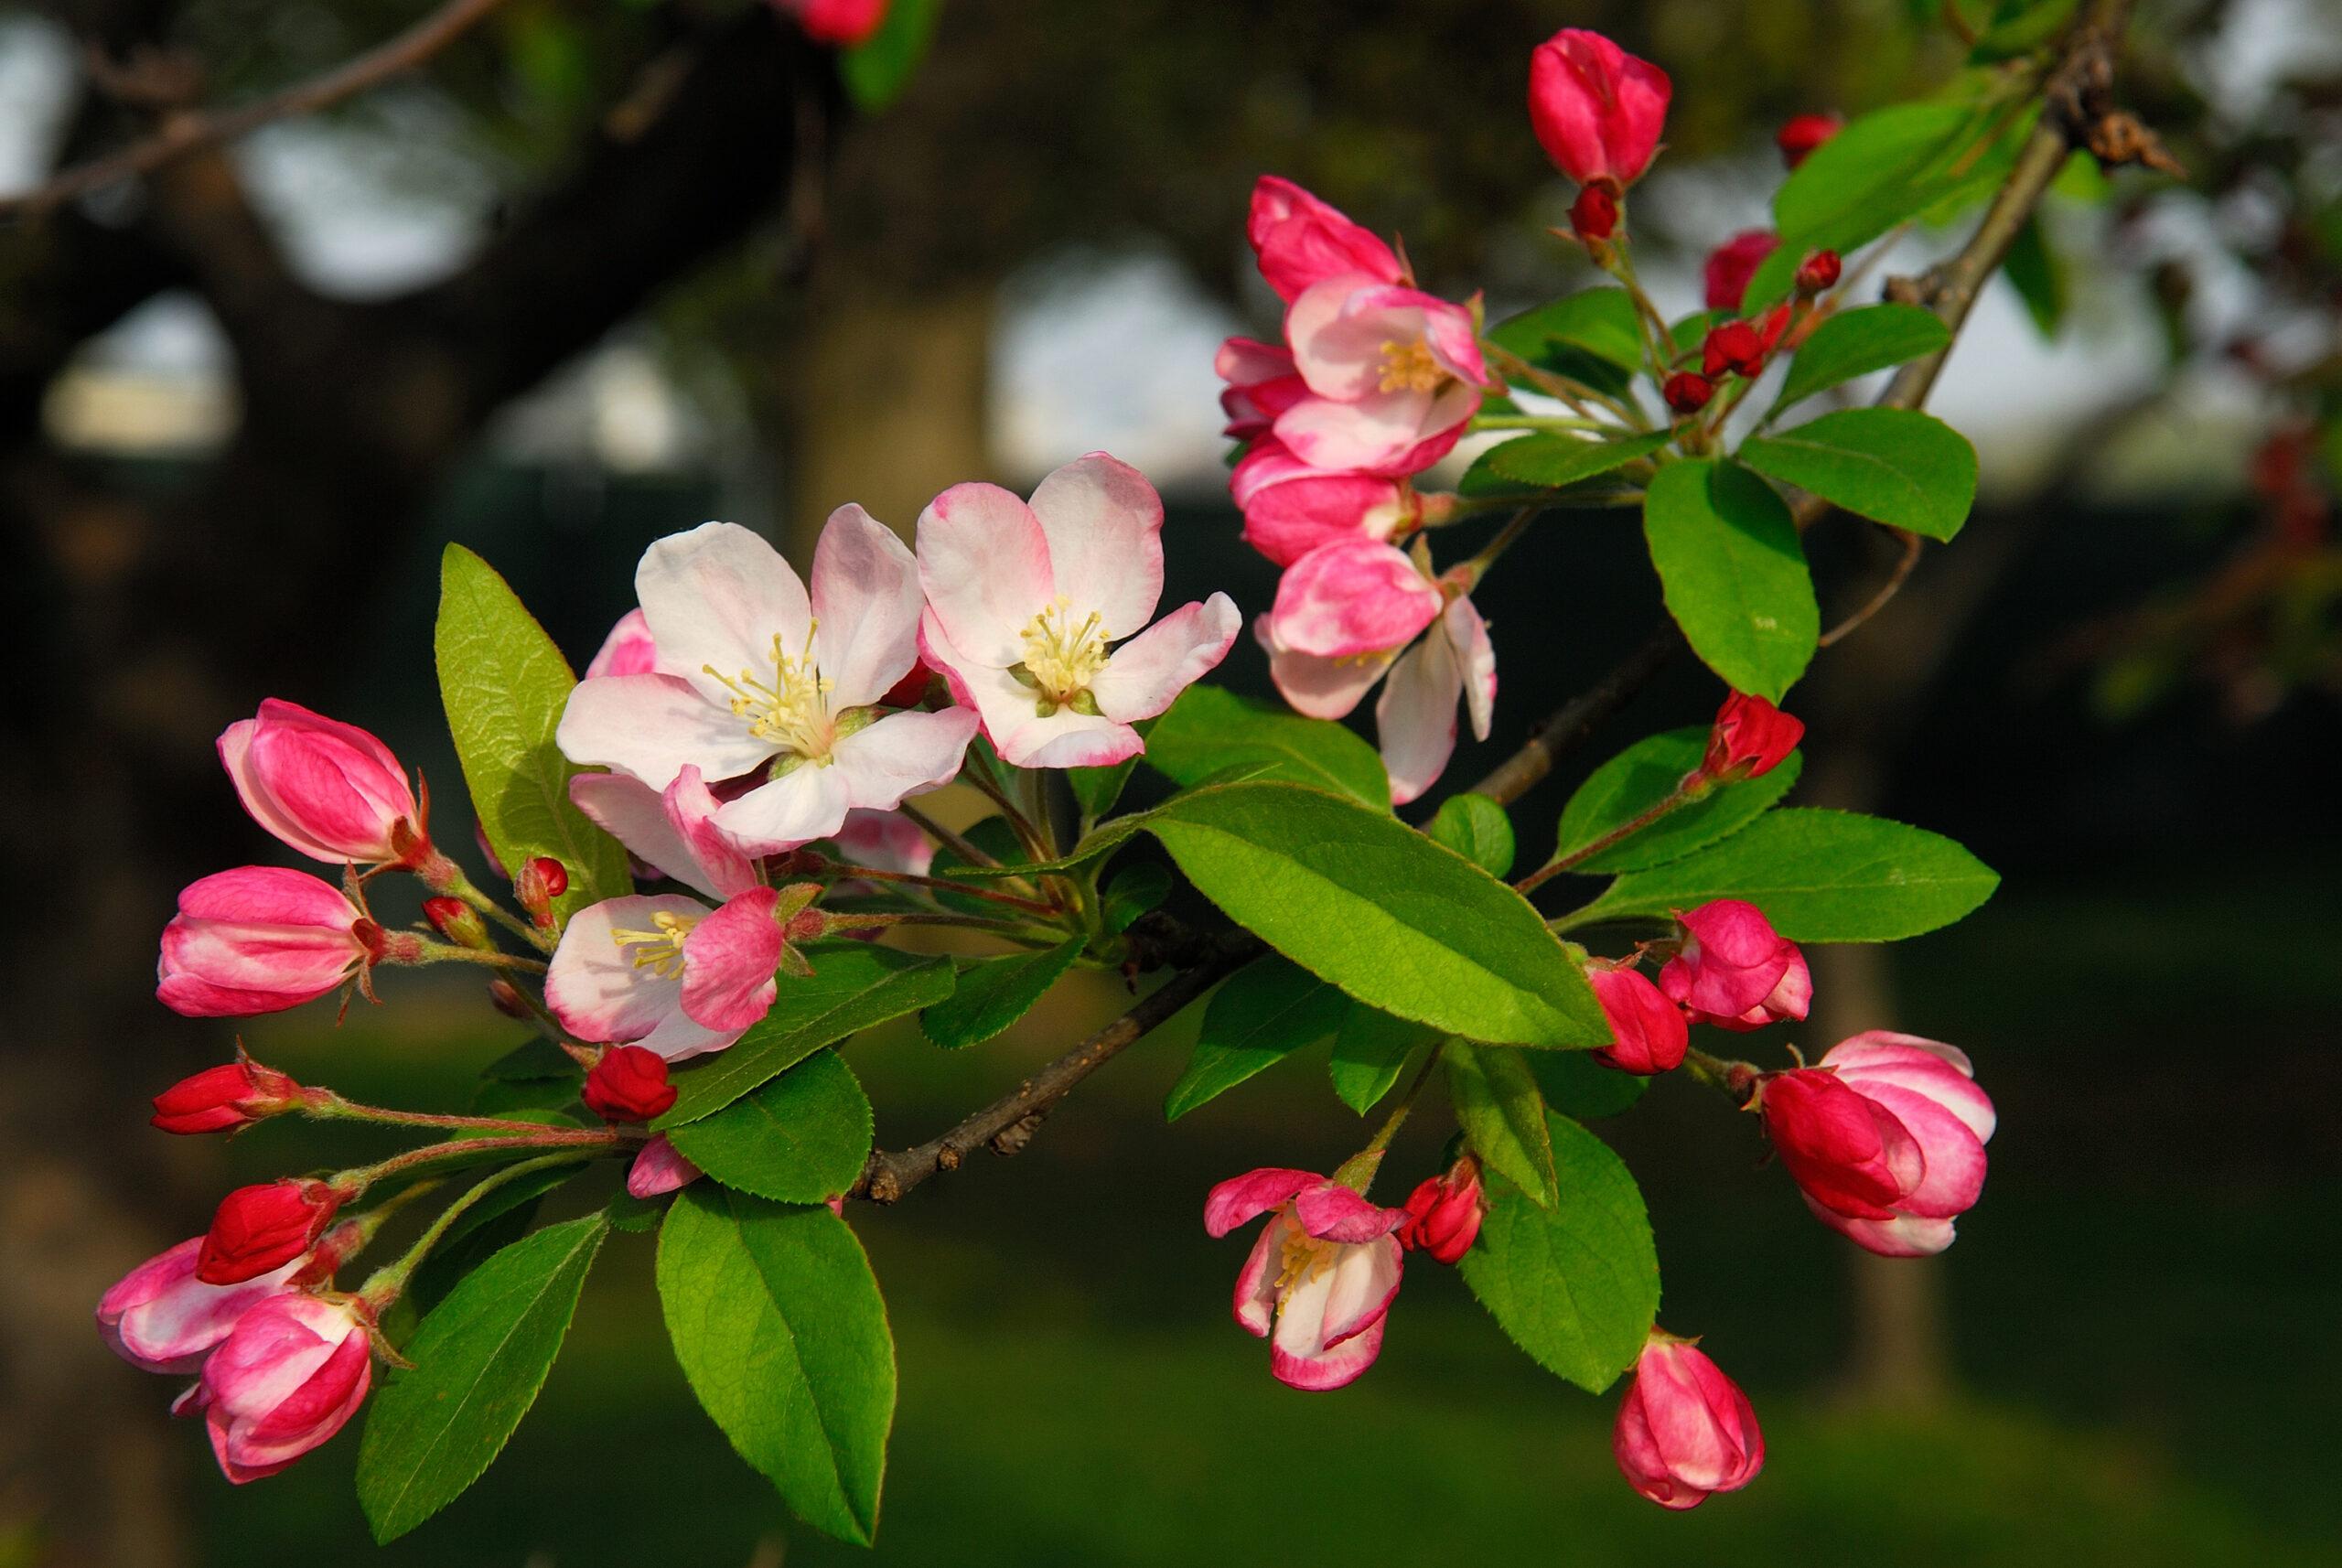 Crabapple Tree Blooming